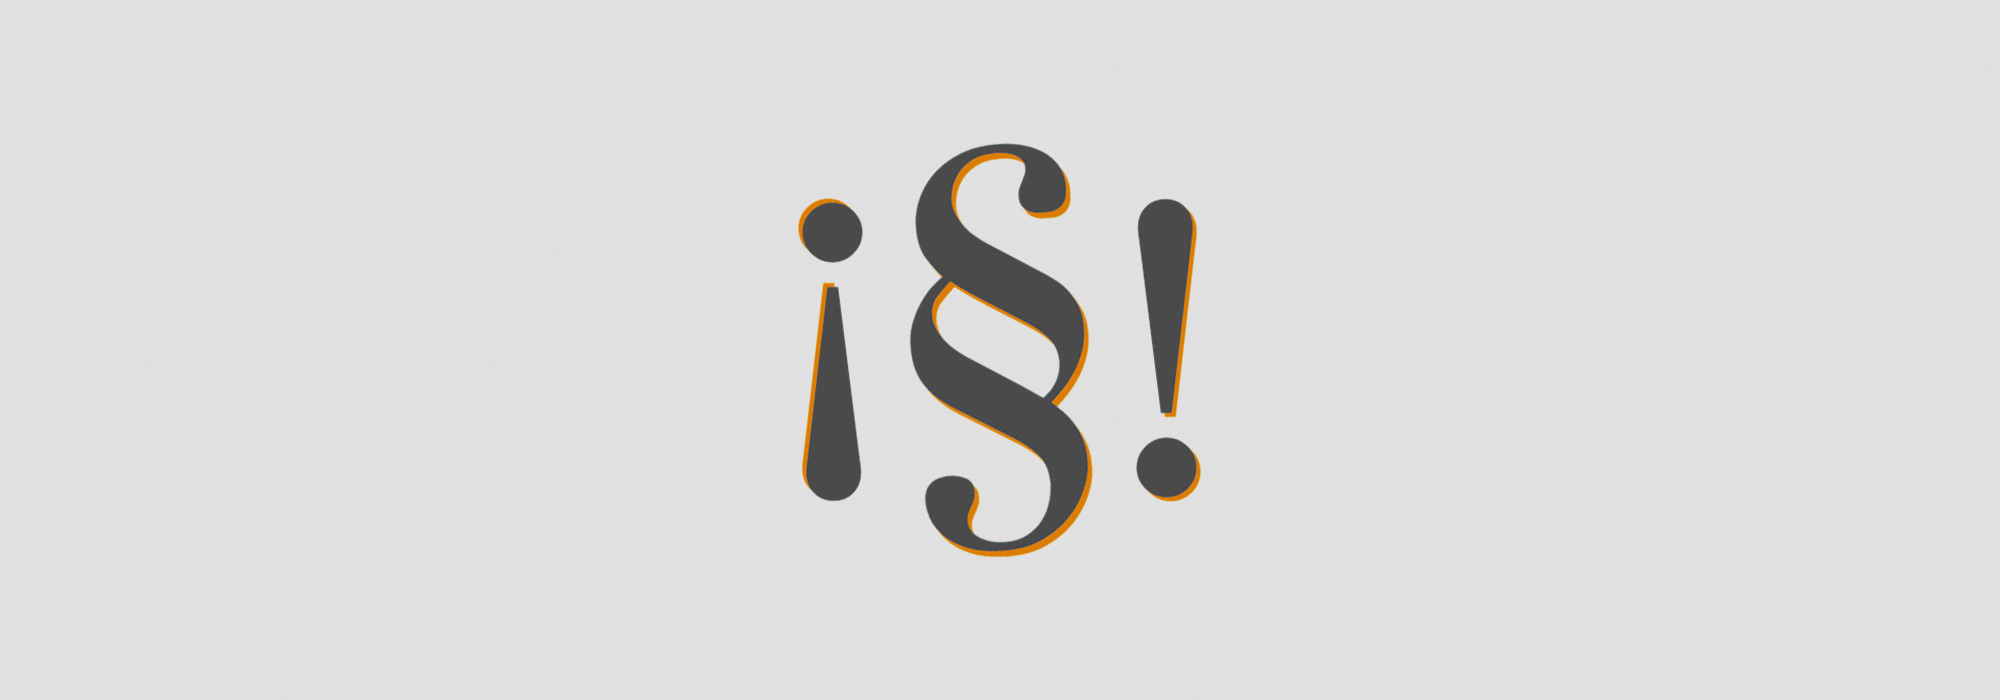 Webseite Rechtsanwaltskanzlei - was ist wichtig?